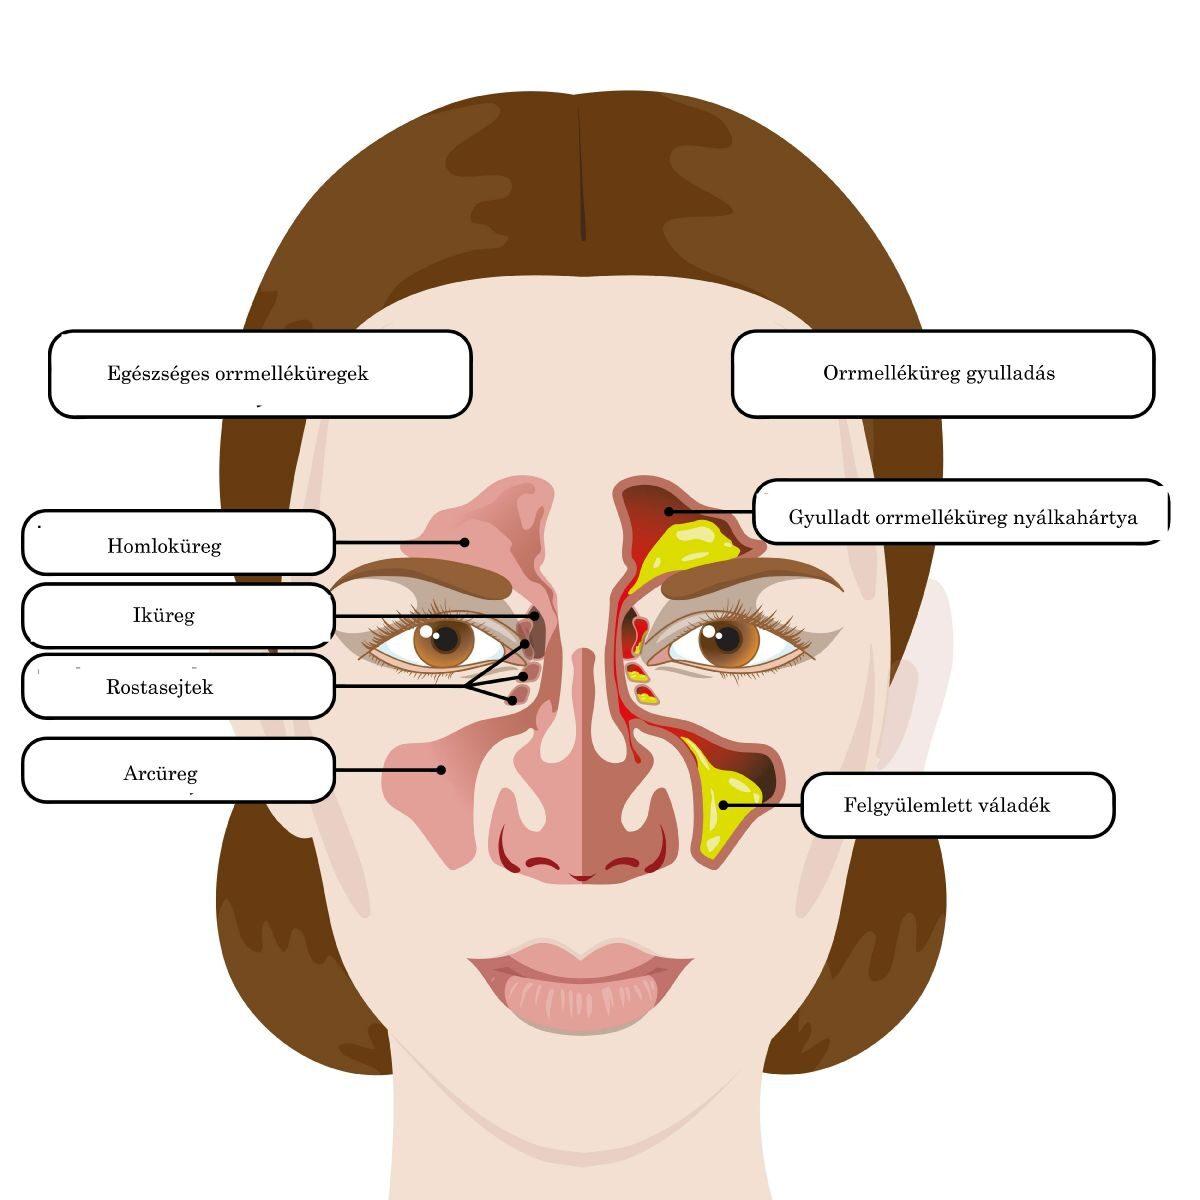 adn humán papilloma vírus 16. tippje